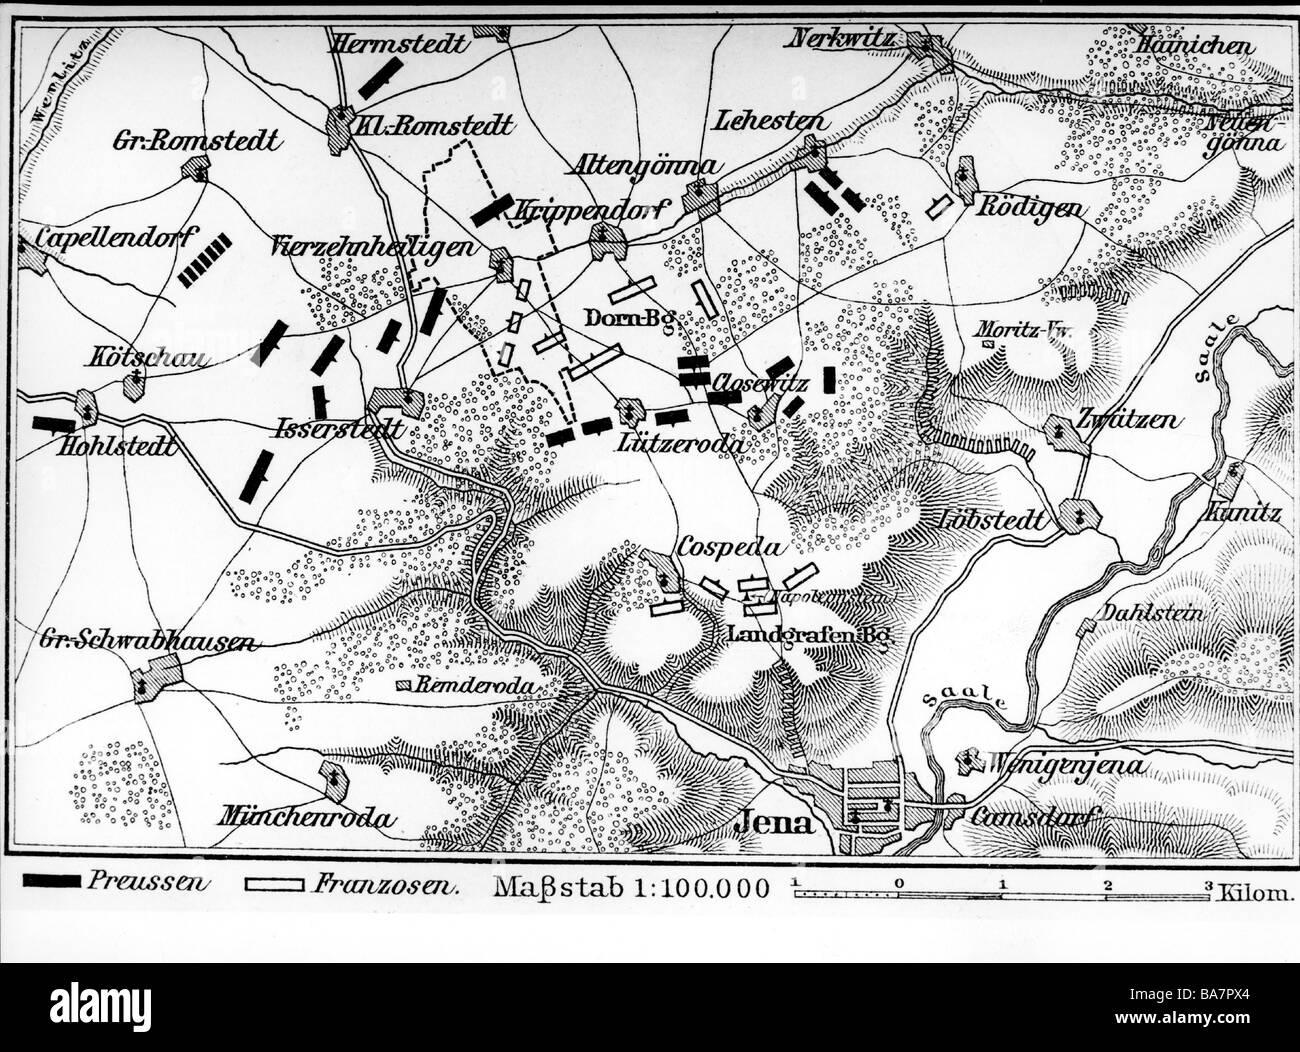 Eventos, War of the Forth Coalition 1806 - 1807, Batalla de Jena 14.10.1806, plan, grabado en madera, siglo 19, guerras napoleónicas, Alemania, Sajonia, mapa, histórico, histórico, cartografía, Foto de stock